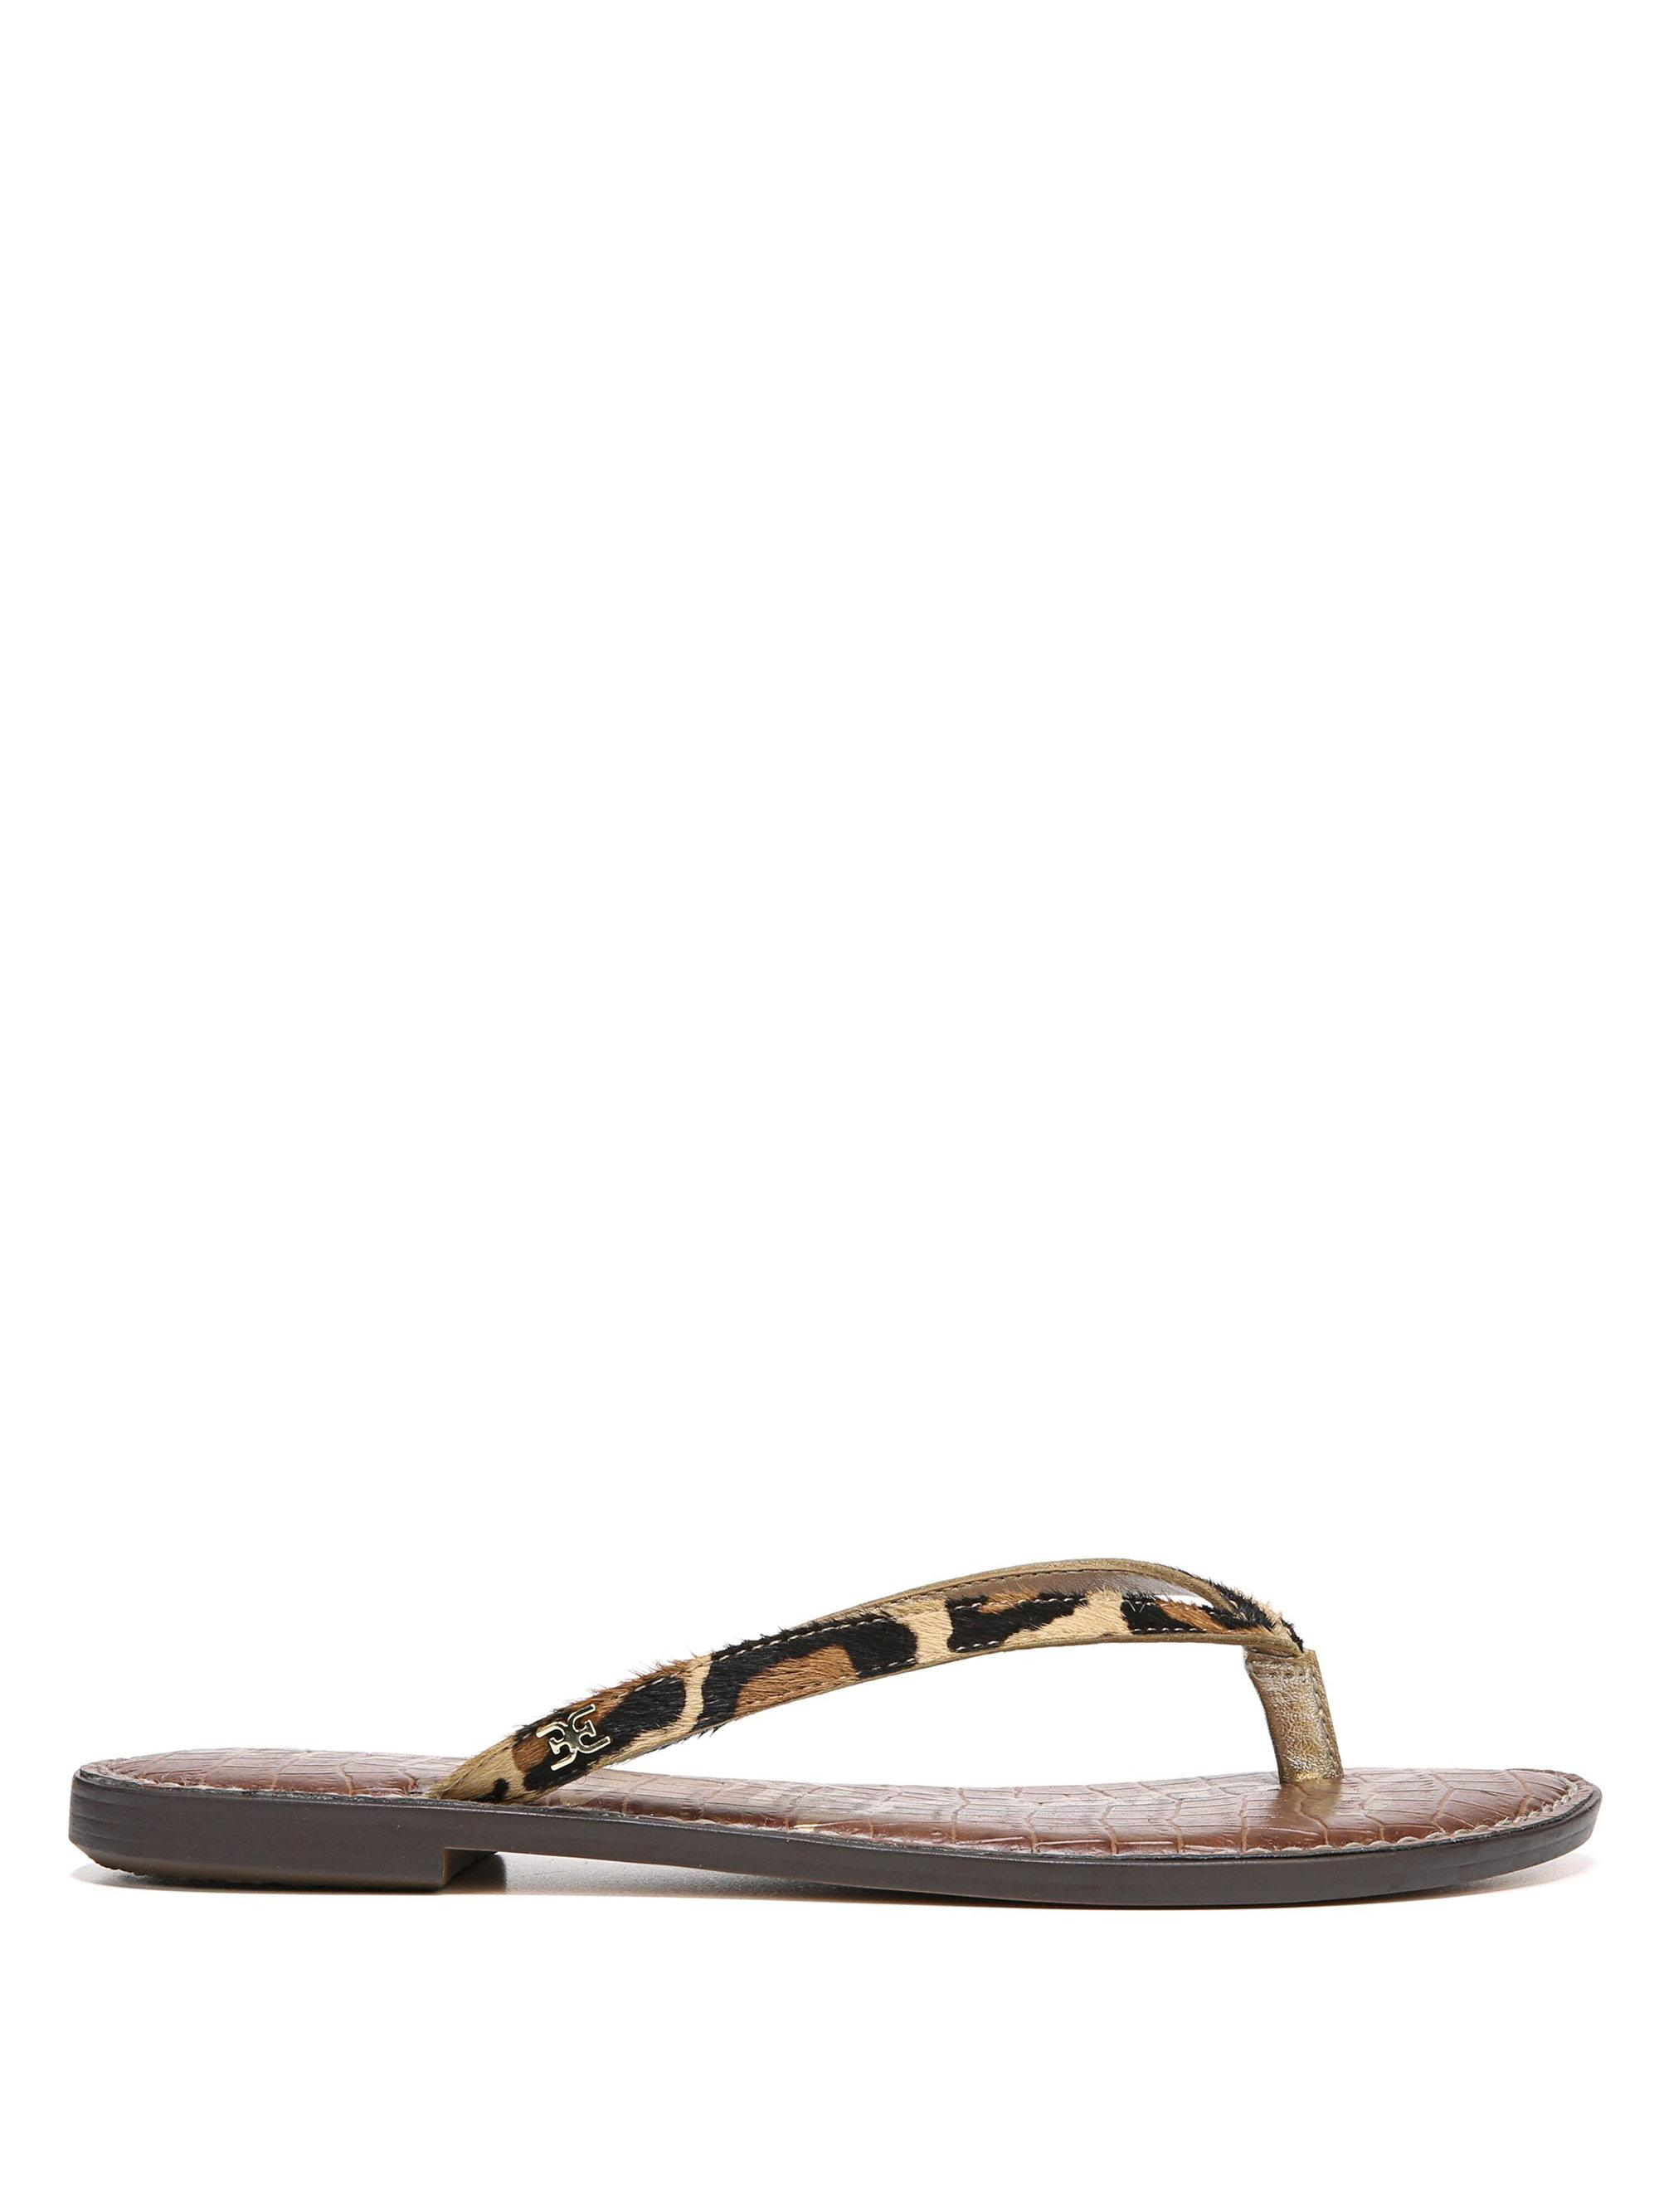 4bbdb26b85f4 Lyst - Sam Edelman Gracie Leopard Brahma Hair Thong Sandals in Brown